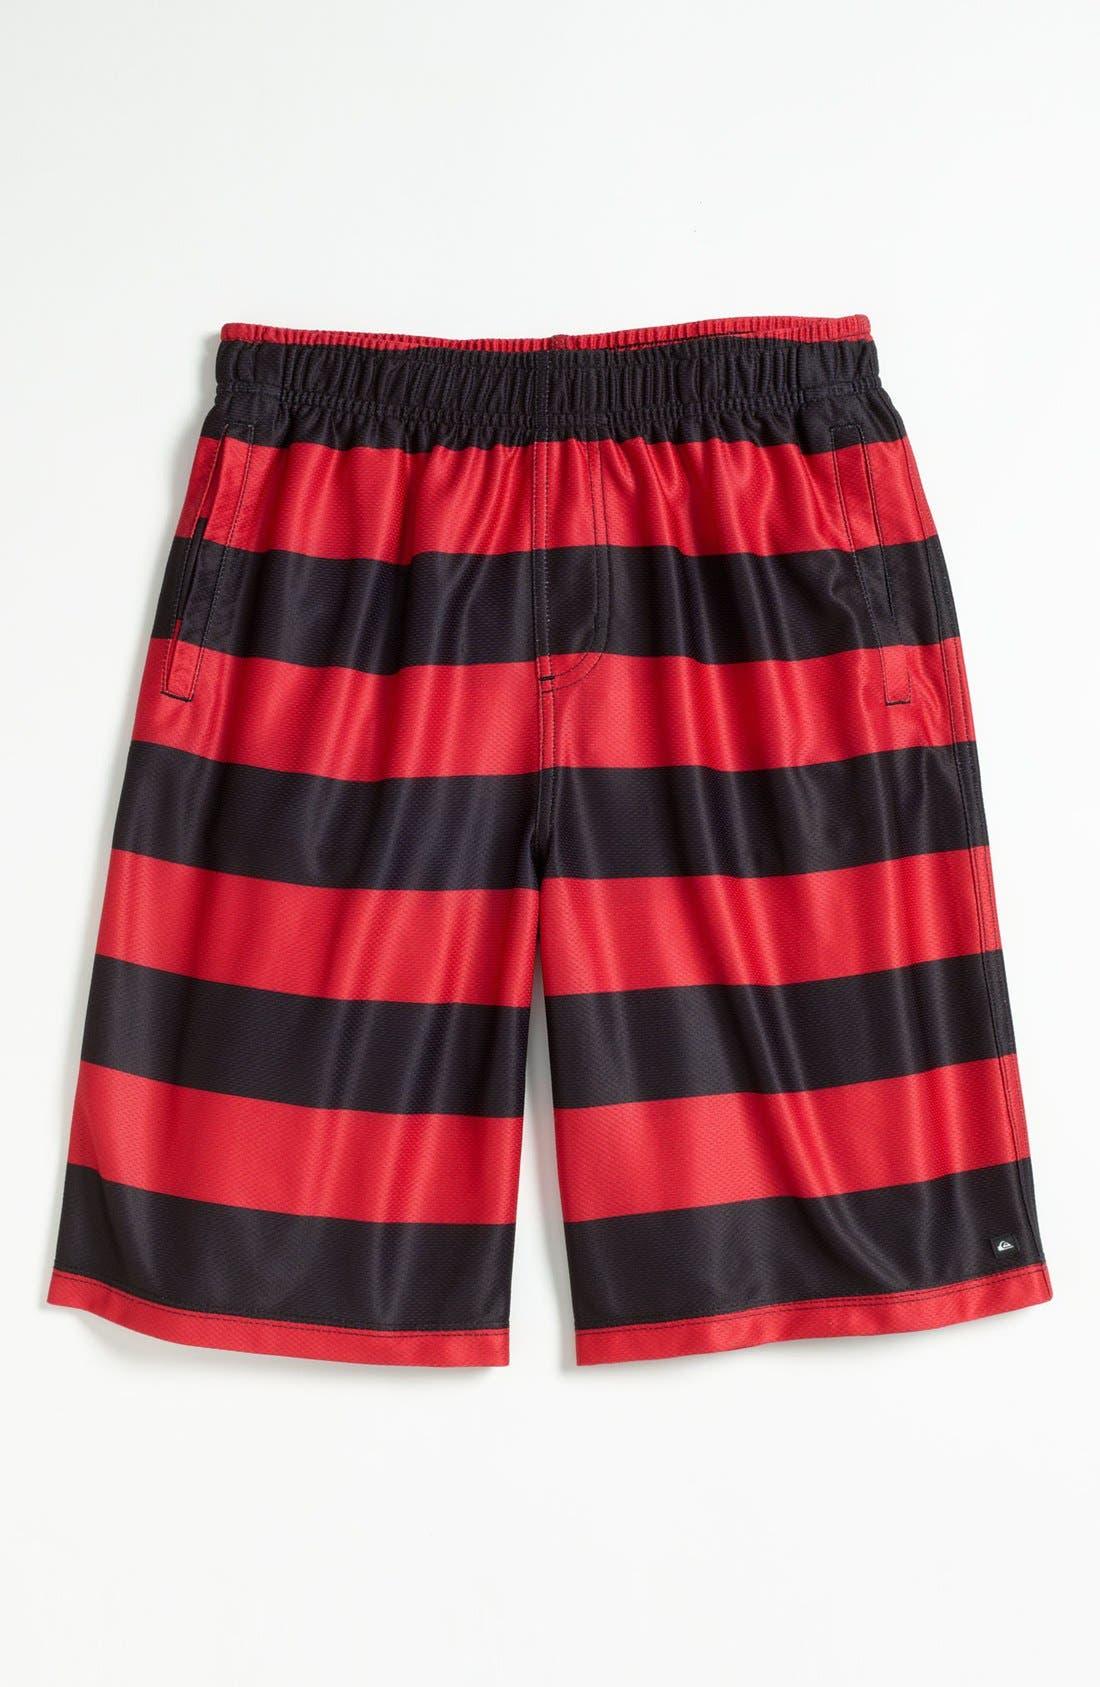 Alternate Image 1 Selected - Quiksilver Stripe Beach Shorts (Little Boys)